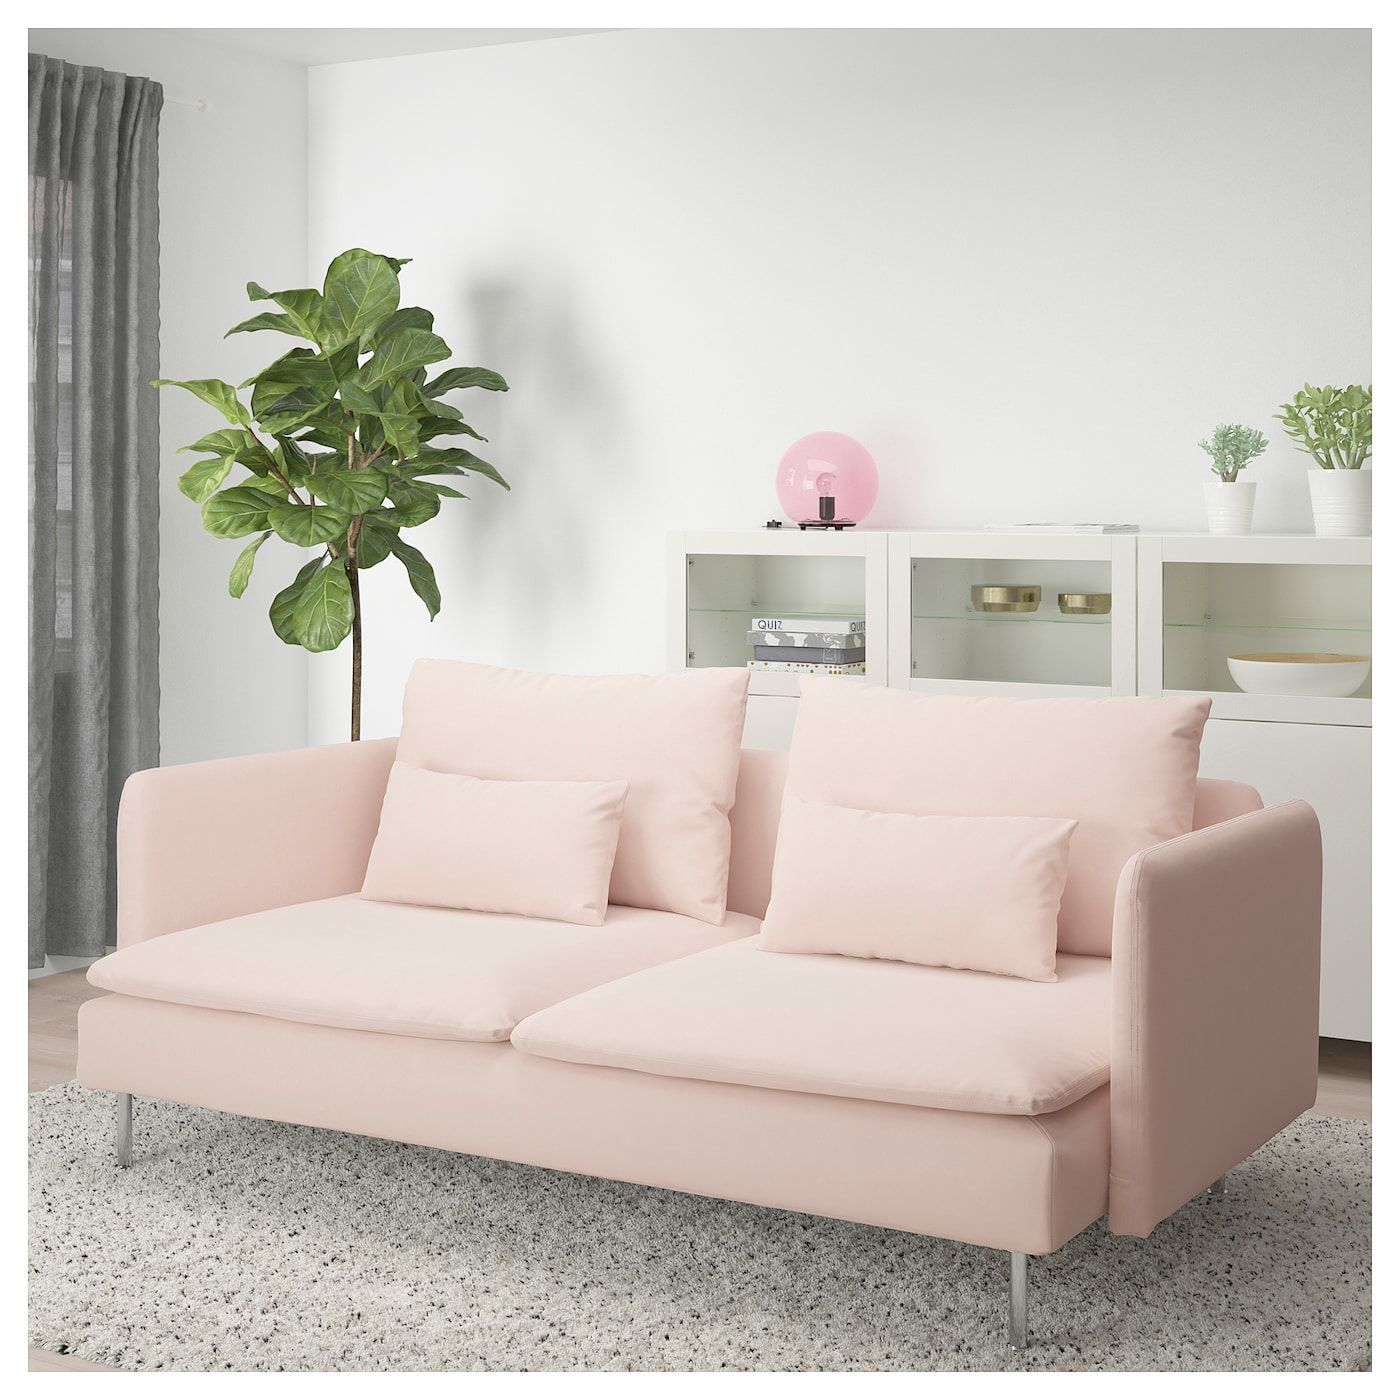 SÖDERHAMN Sofa Samsta light pink Sofa, Ikea